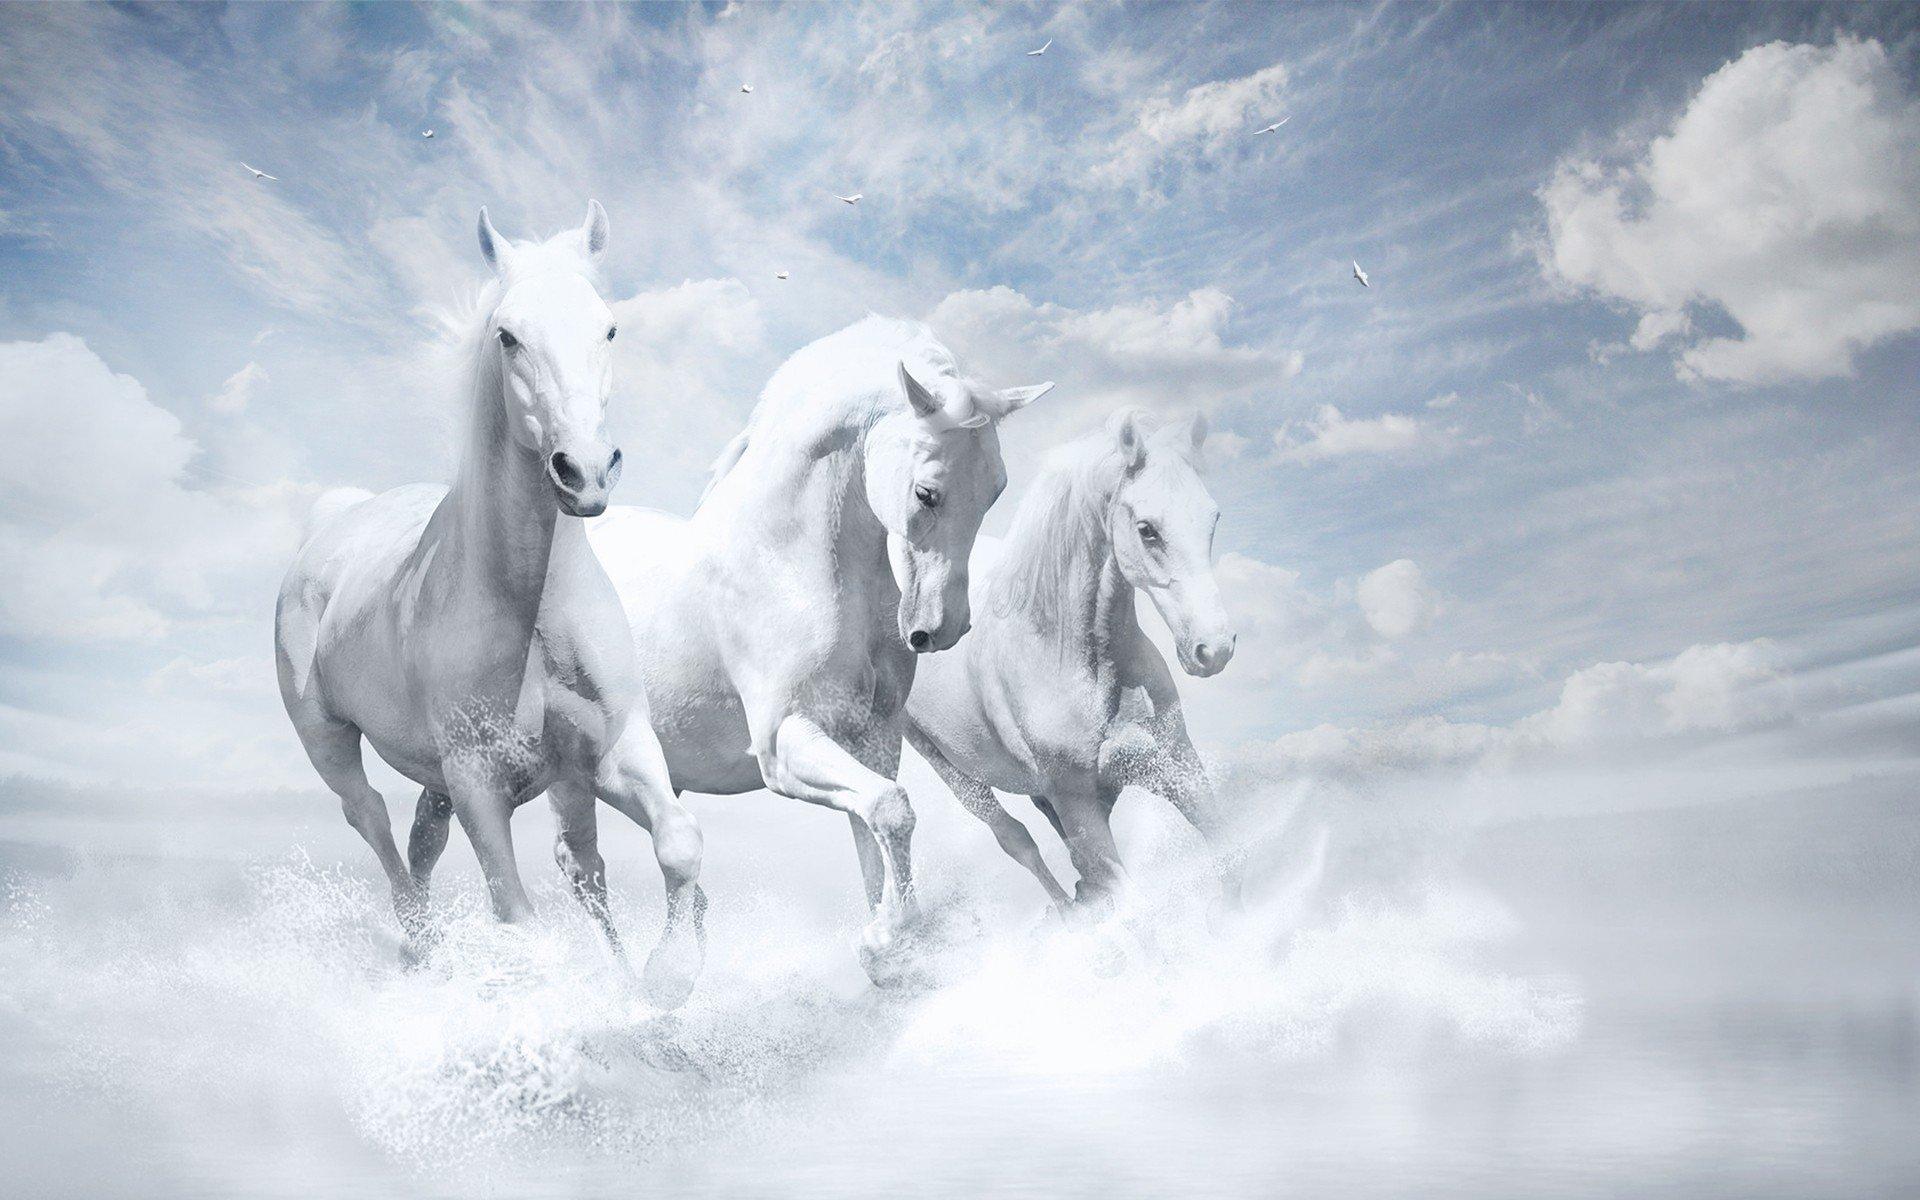 1920x1080 white horses hd laptop full hd 1080p hd 4k